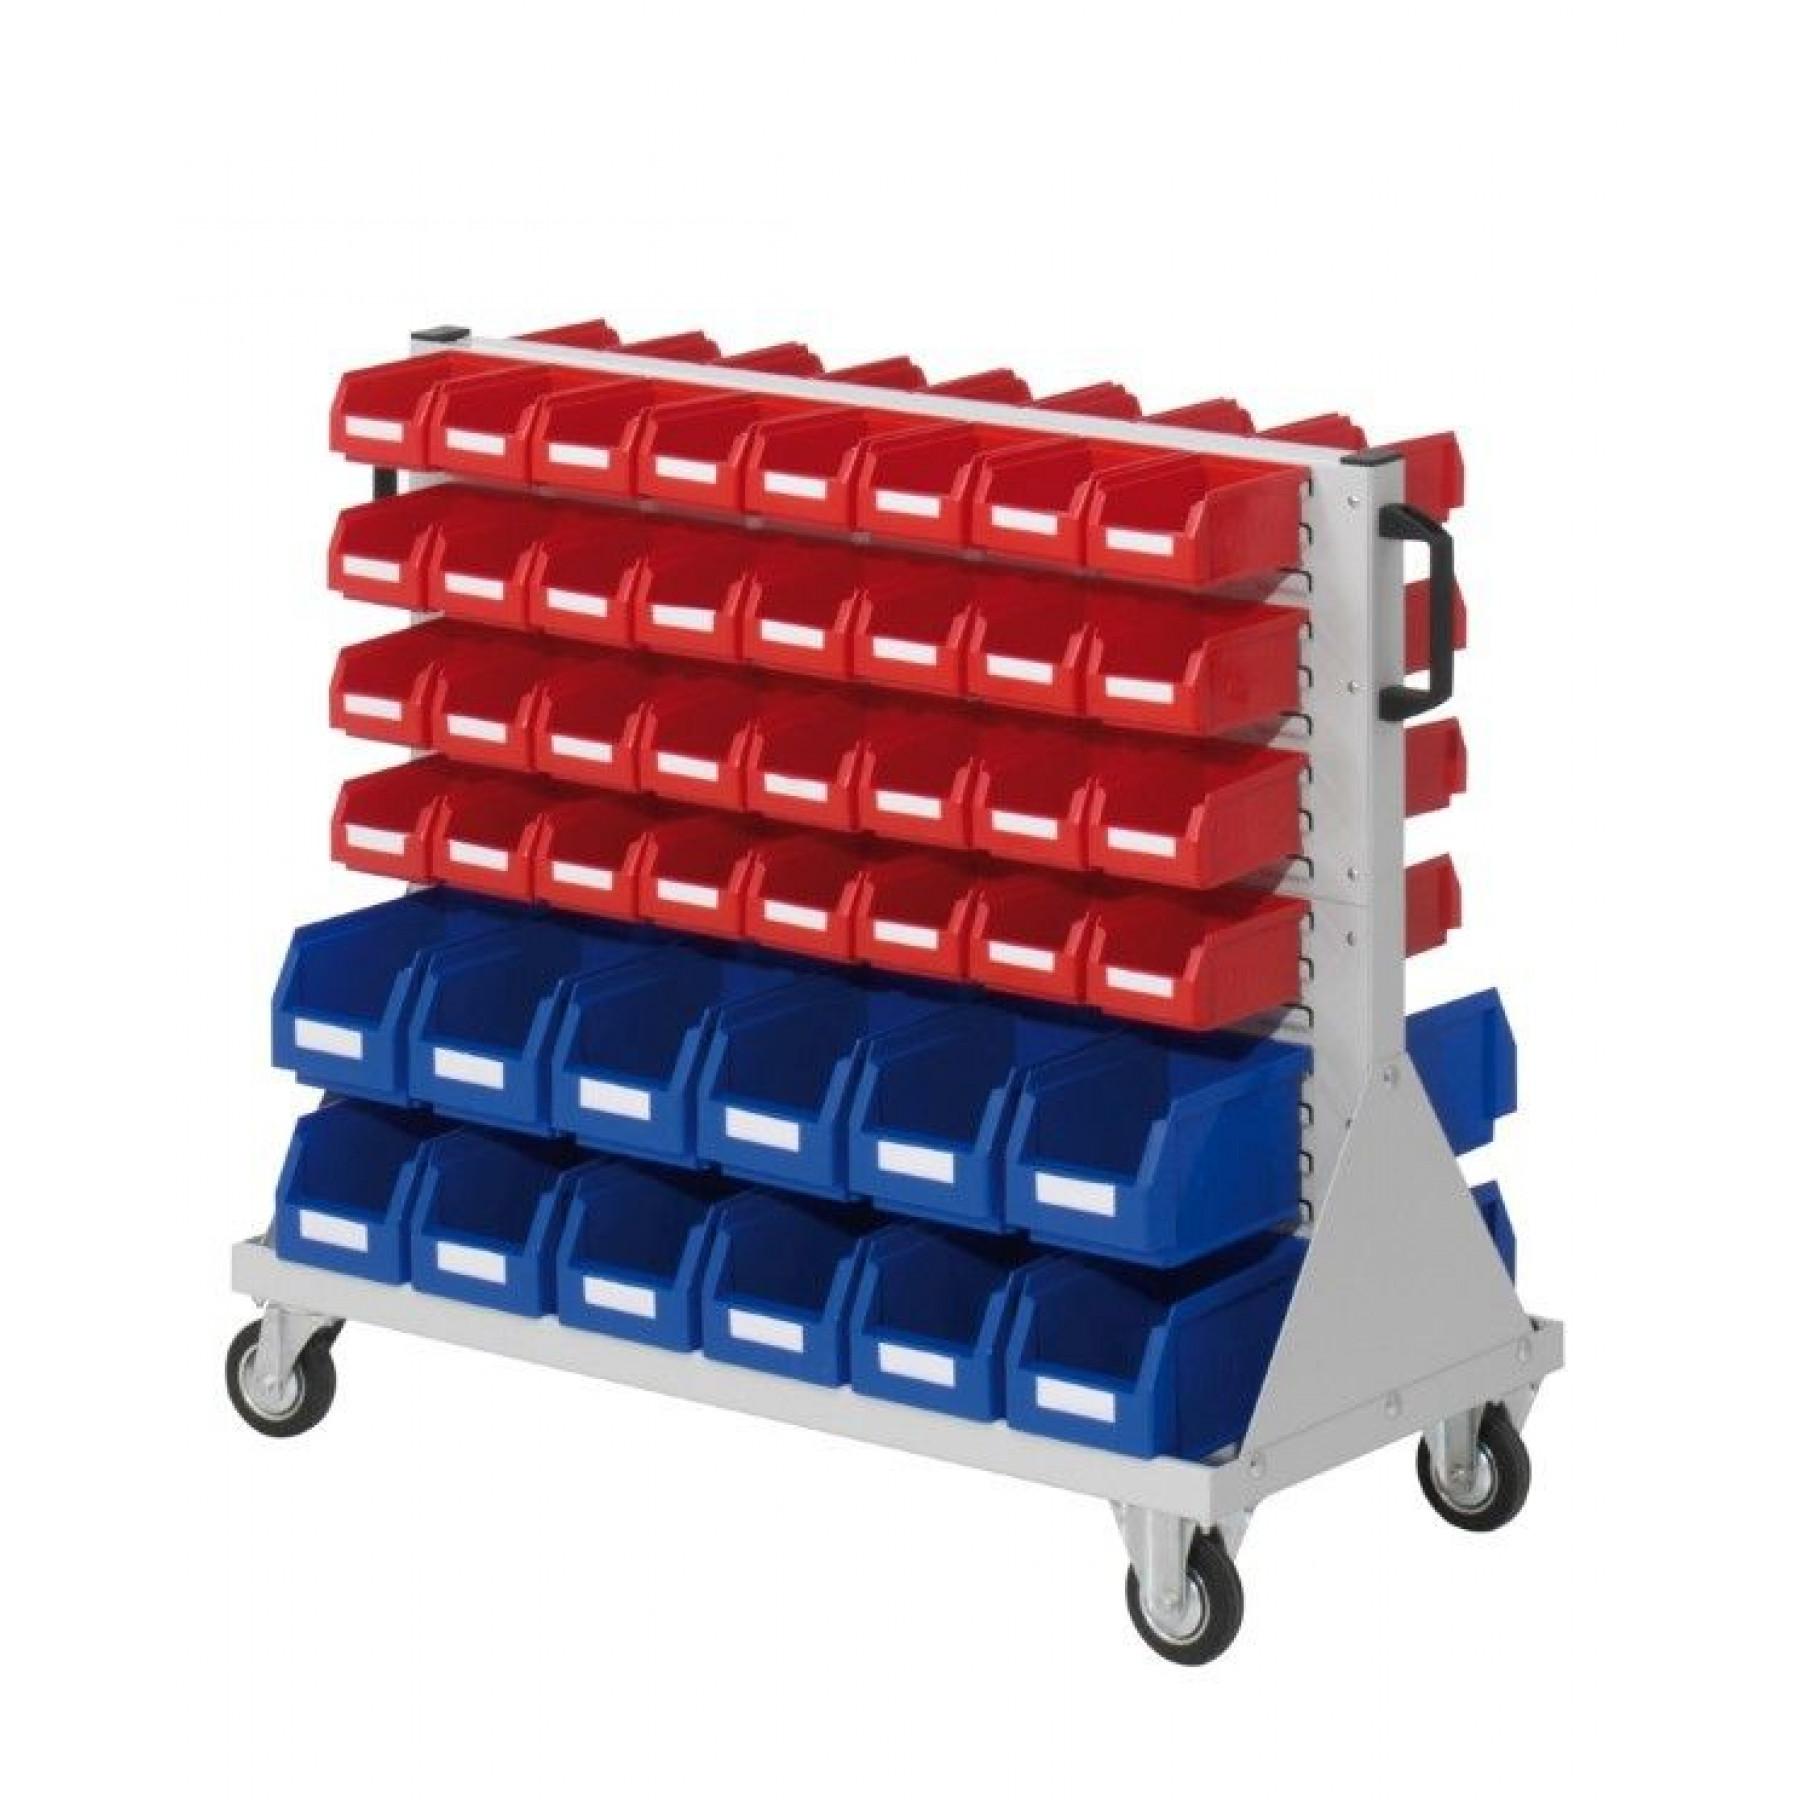 RasterMobil® rijdende bakkenstelling 1000x500x890 mm (LxBxH), 7020.01.0913